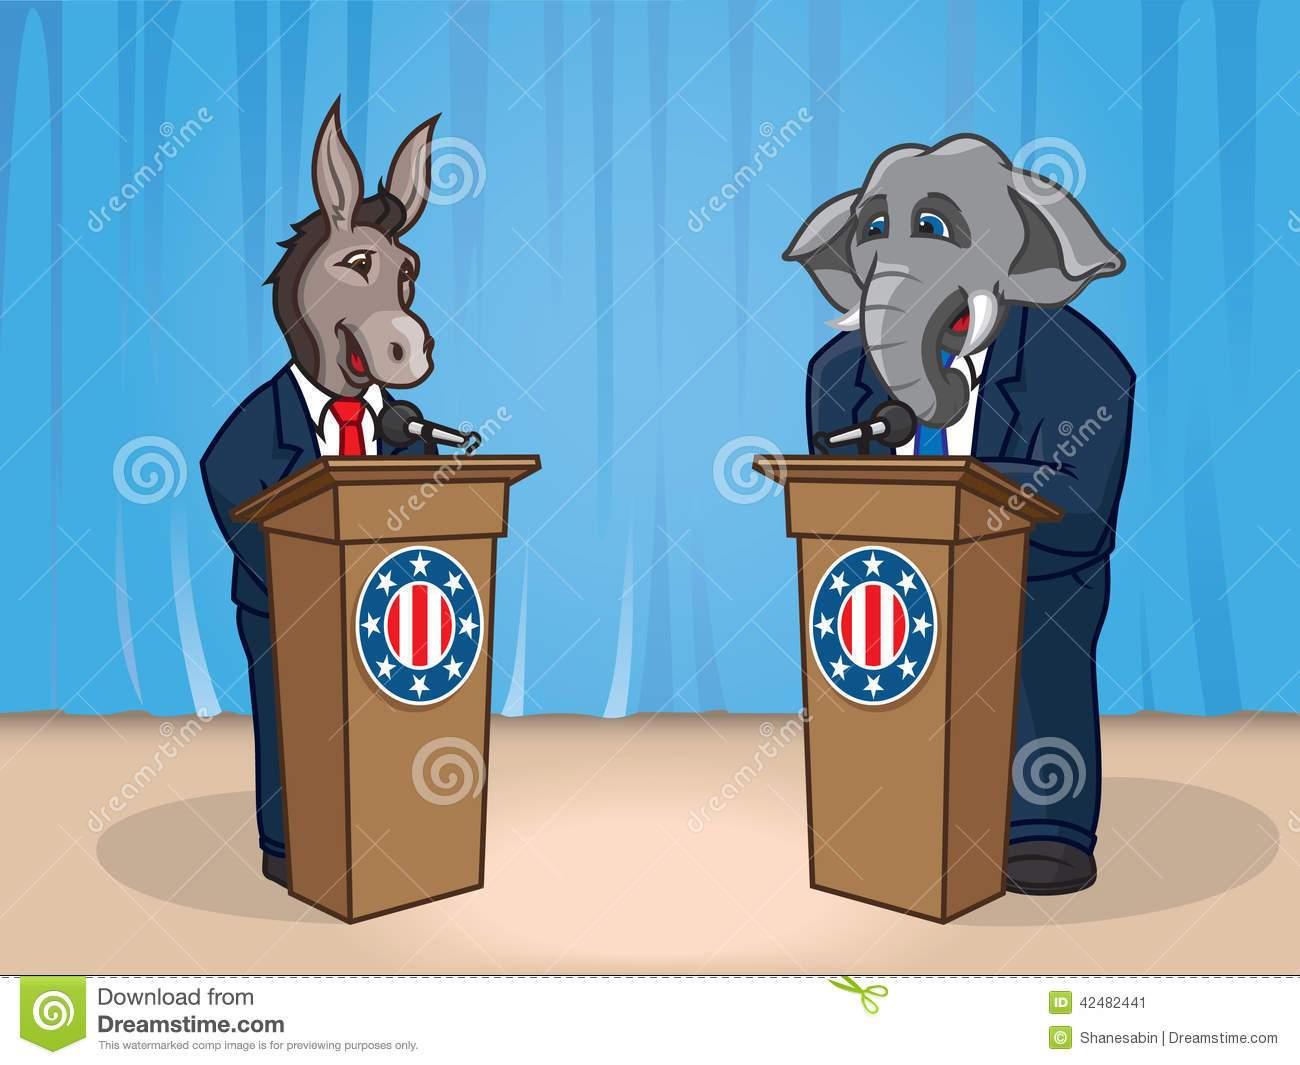 Debate clipart political situation. Portal